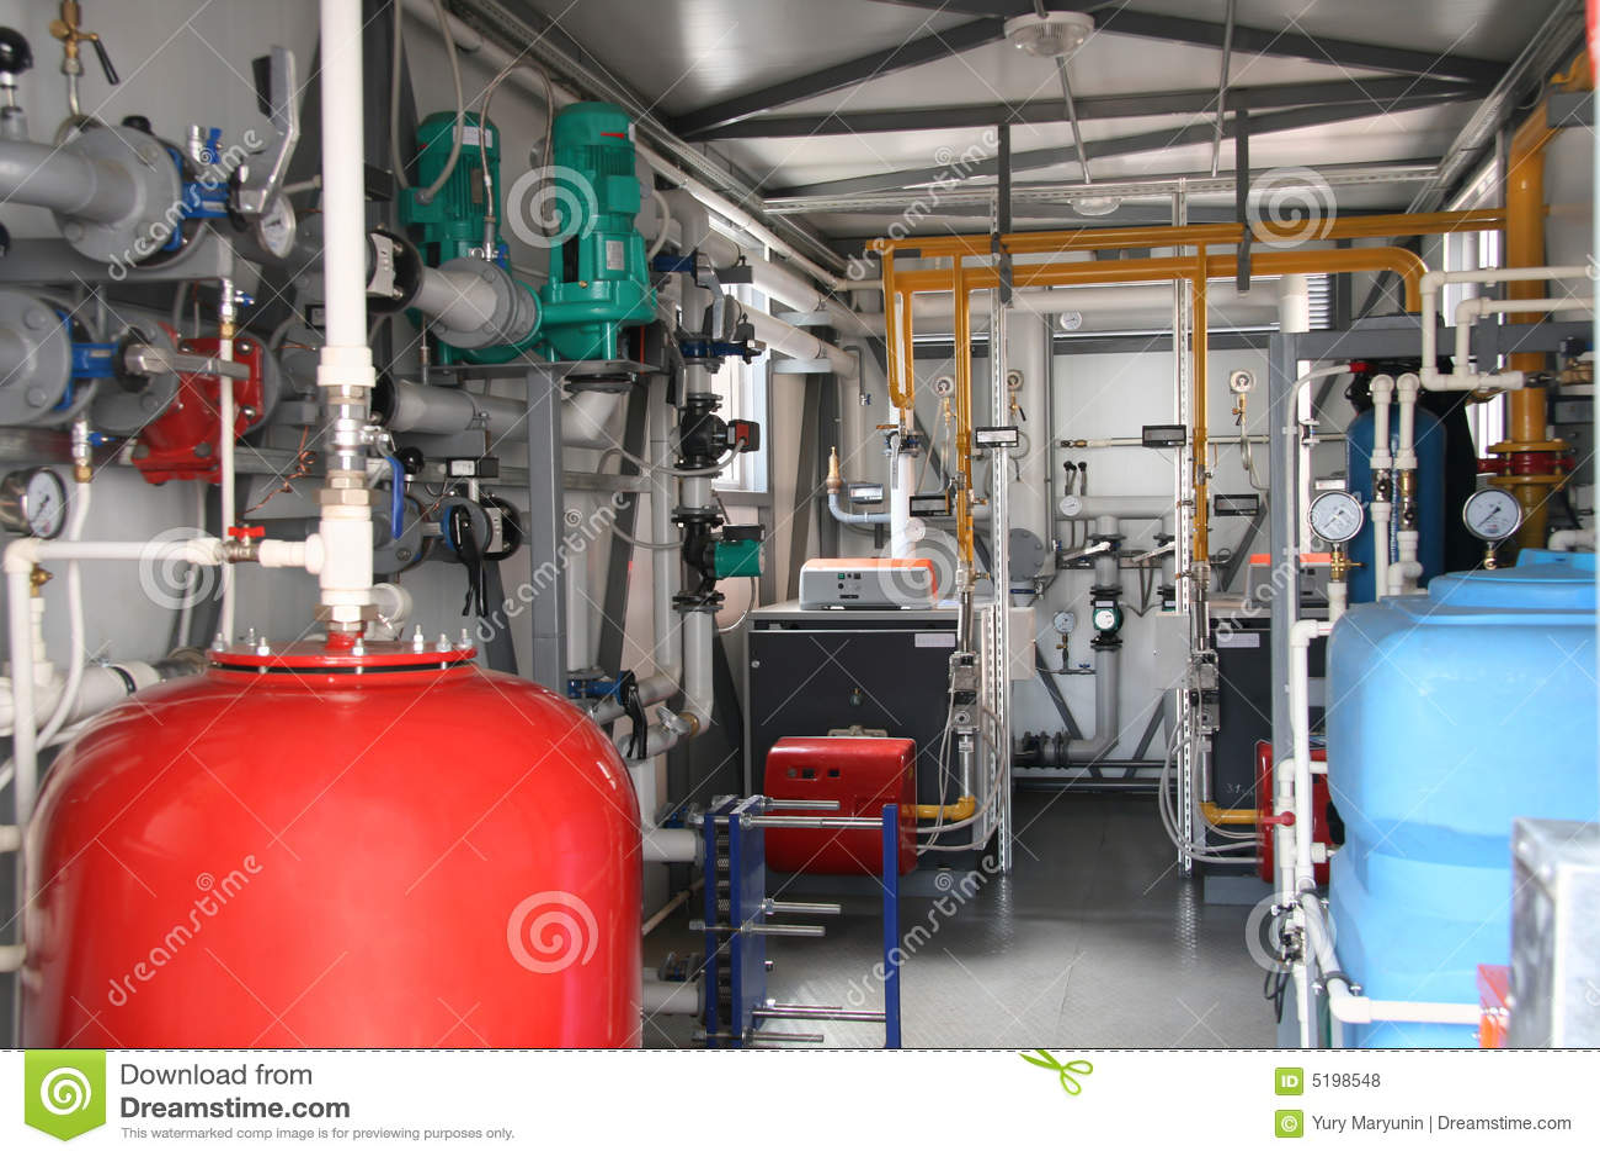 Interior Of Modern Gas Boiler-house Stock Photo - Image of modern ...